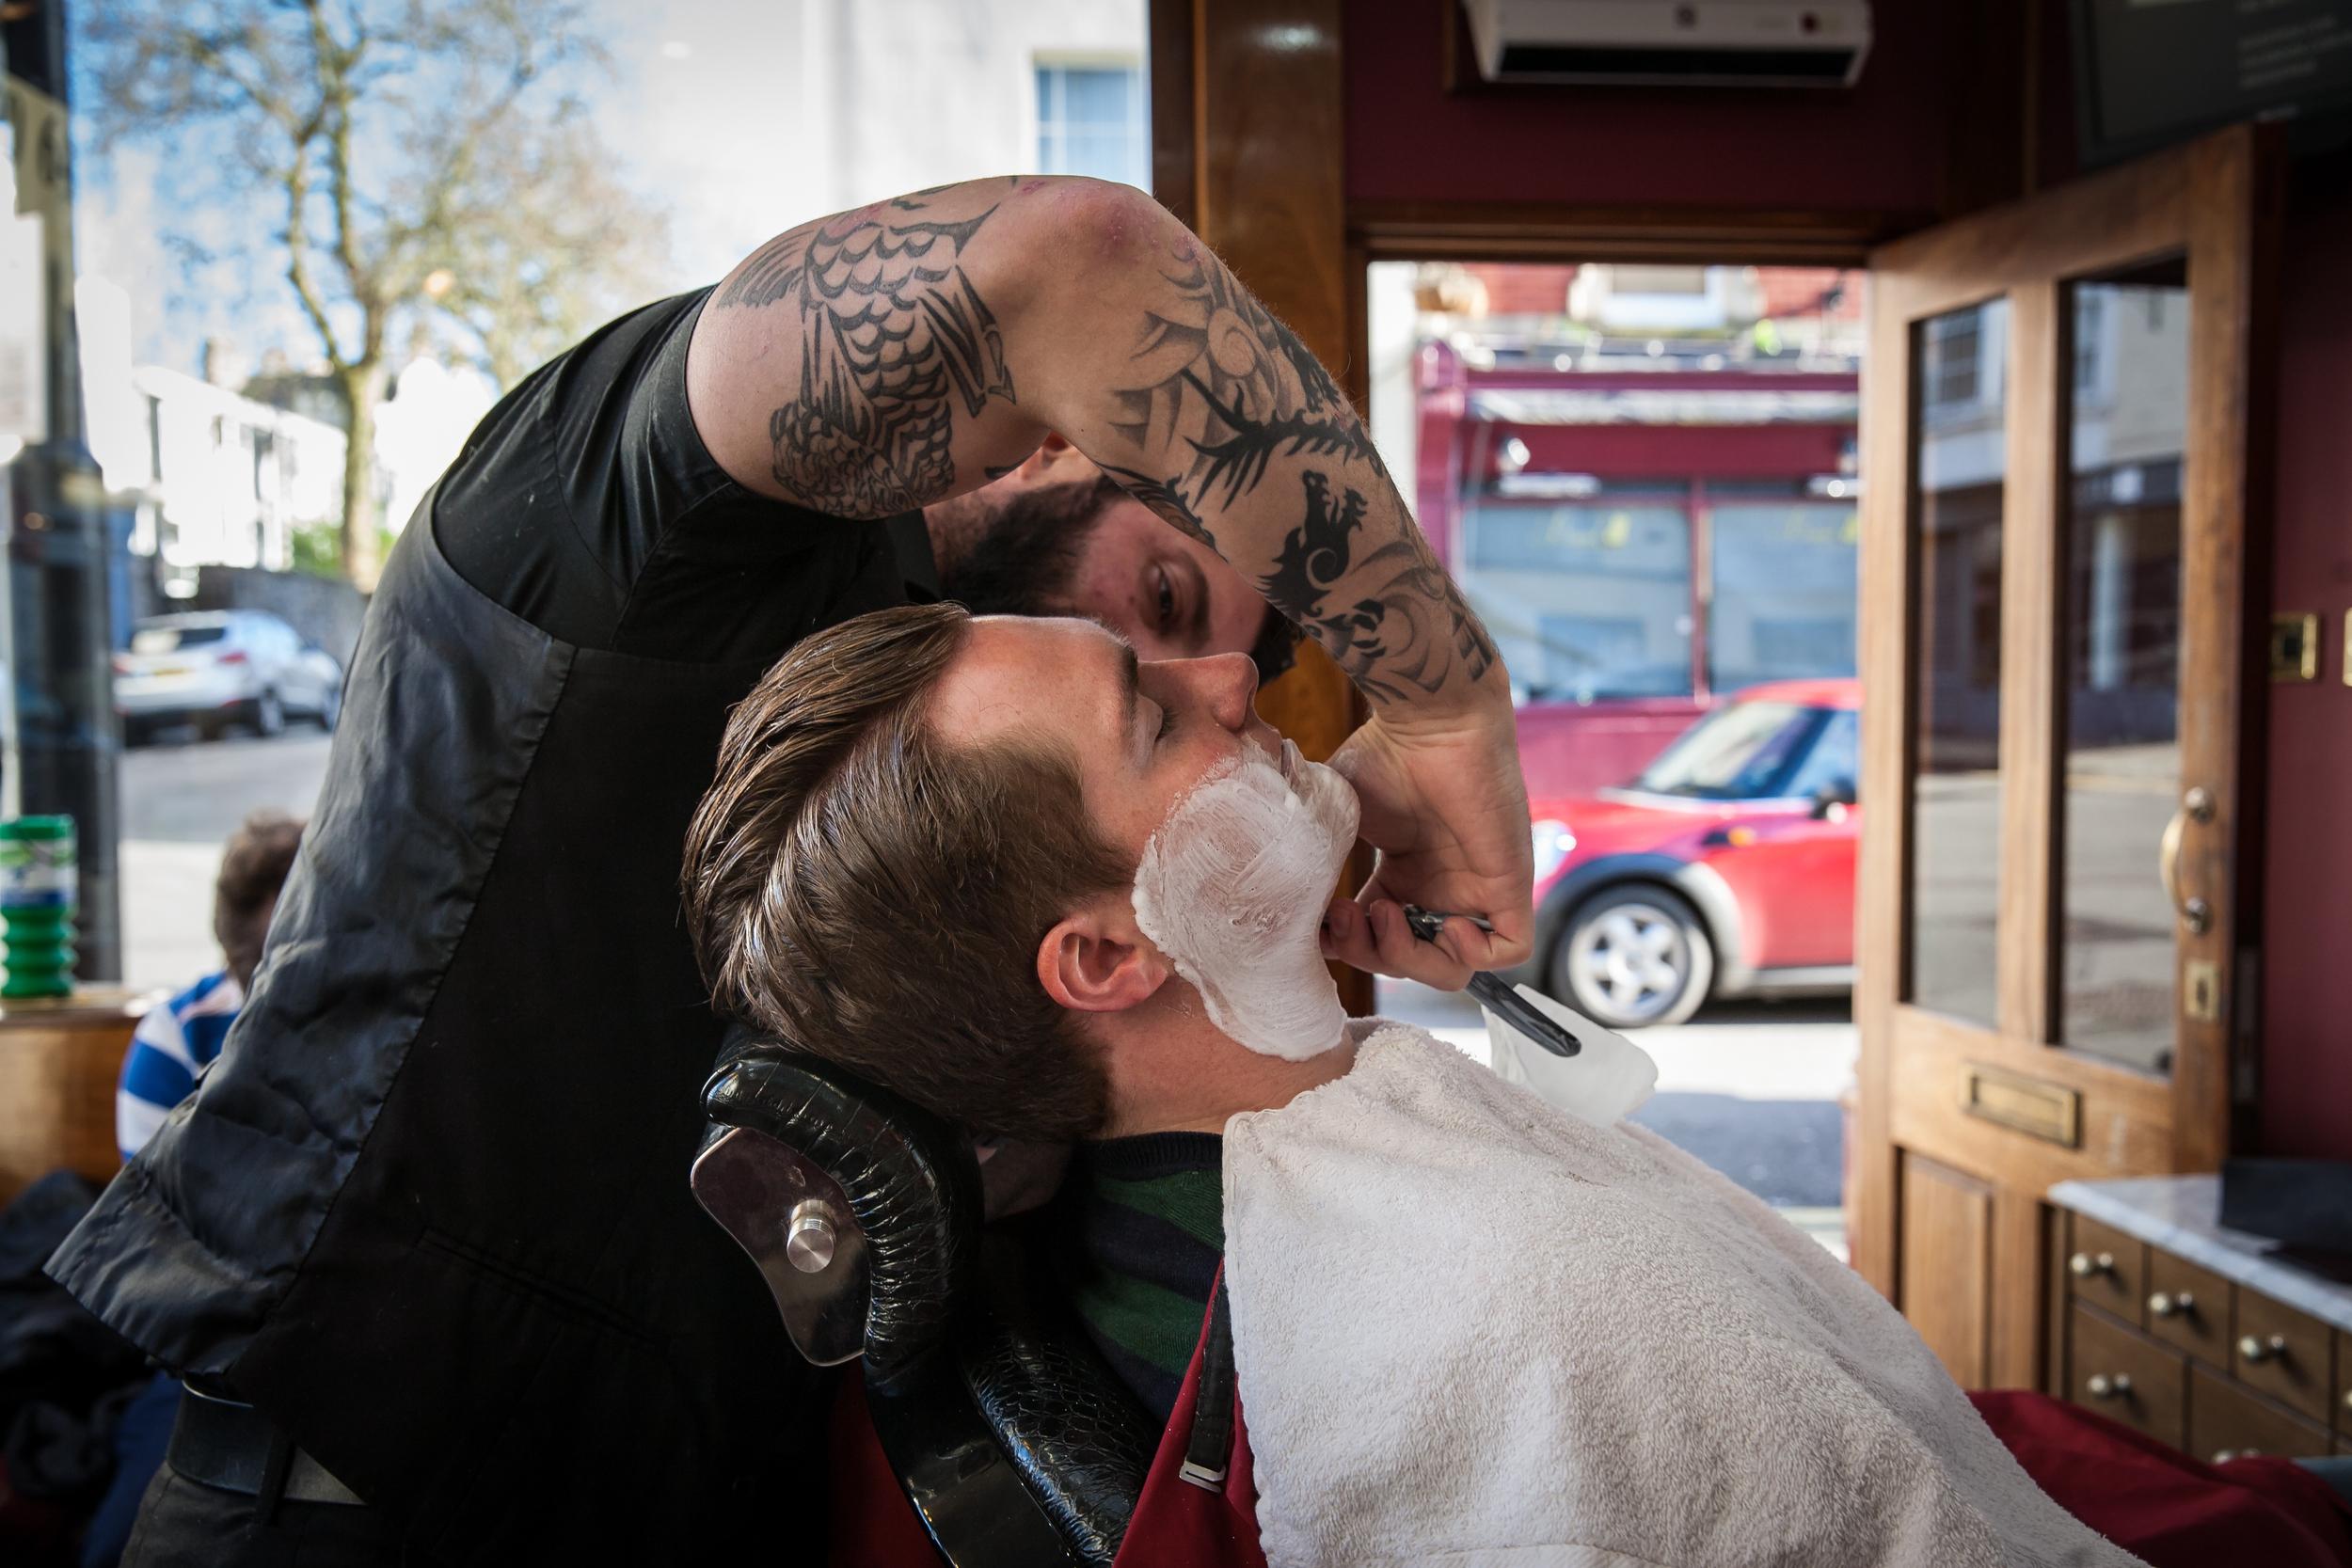 British Barber Shop, Clifton,Barber Shop Photo Essay for   Bristol 24/7 Magazine .